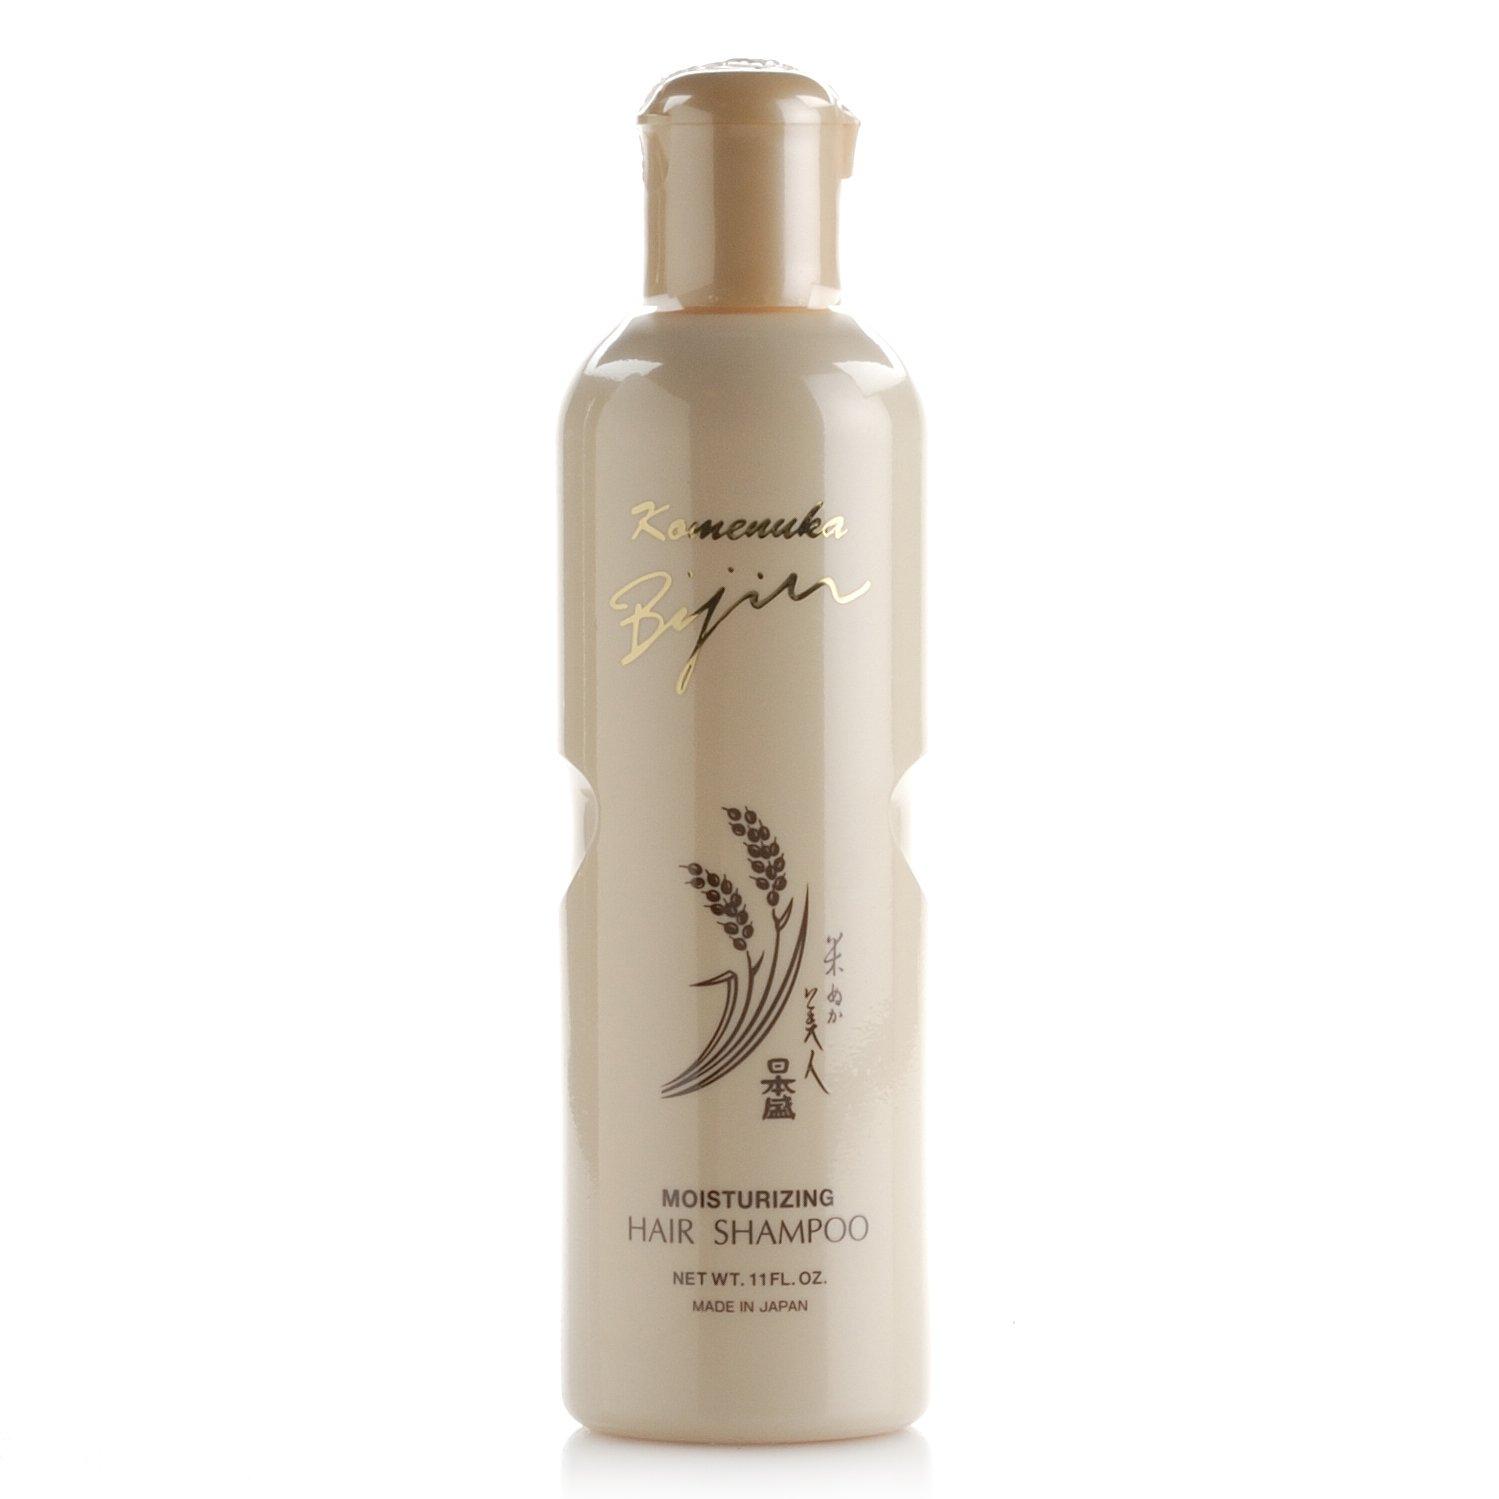 tsubaki shampoo for colored hair